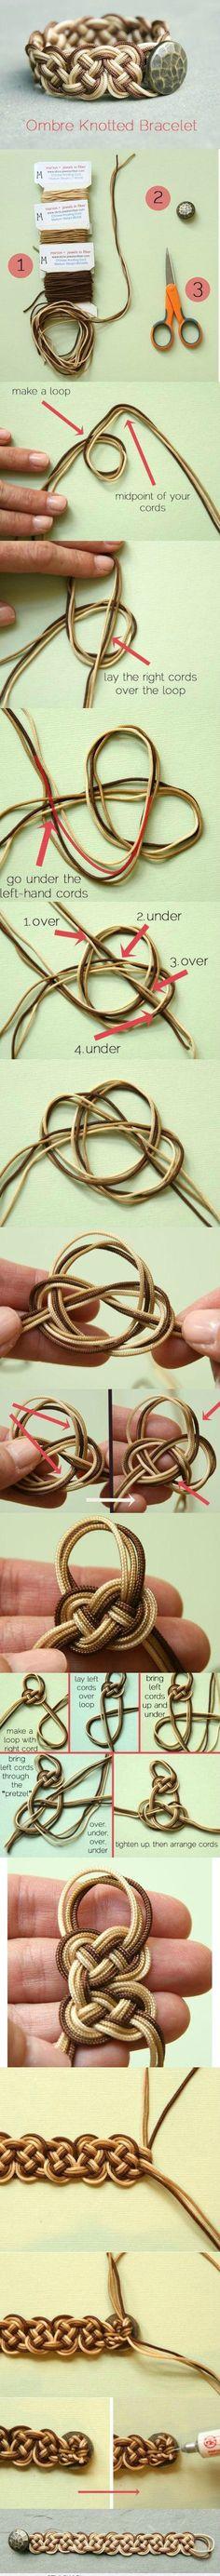 Ombre knotted bracelet.